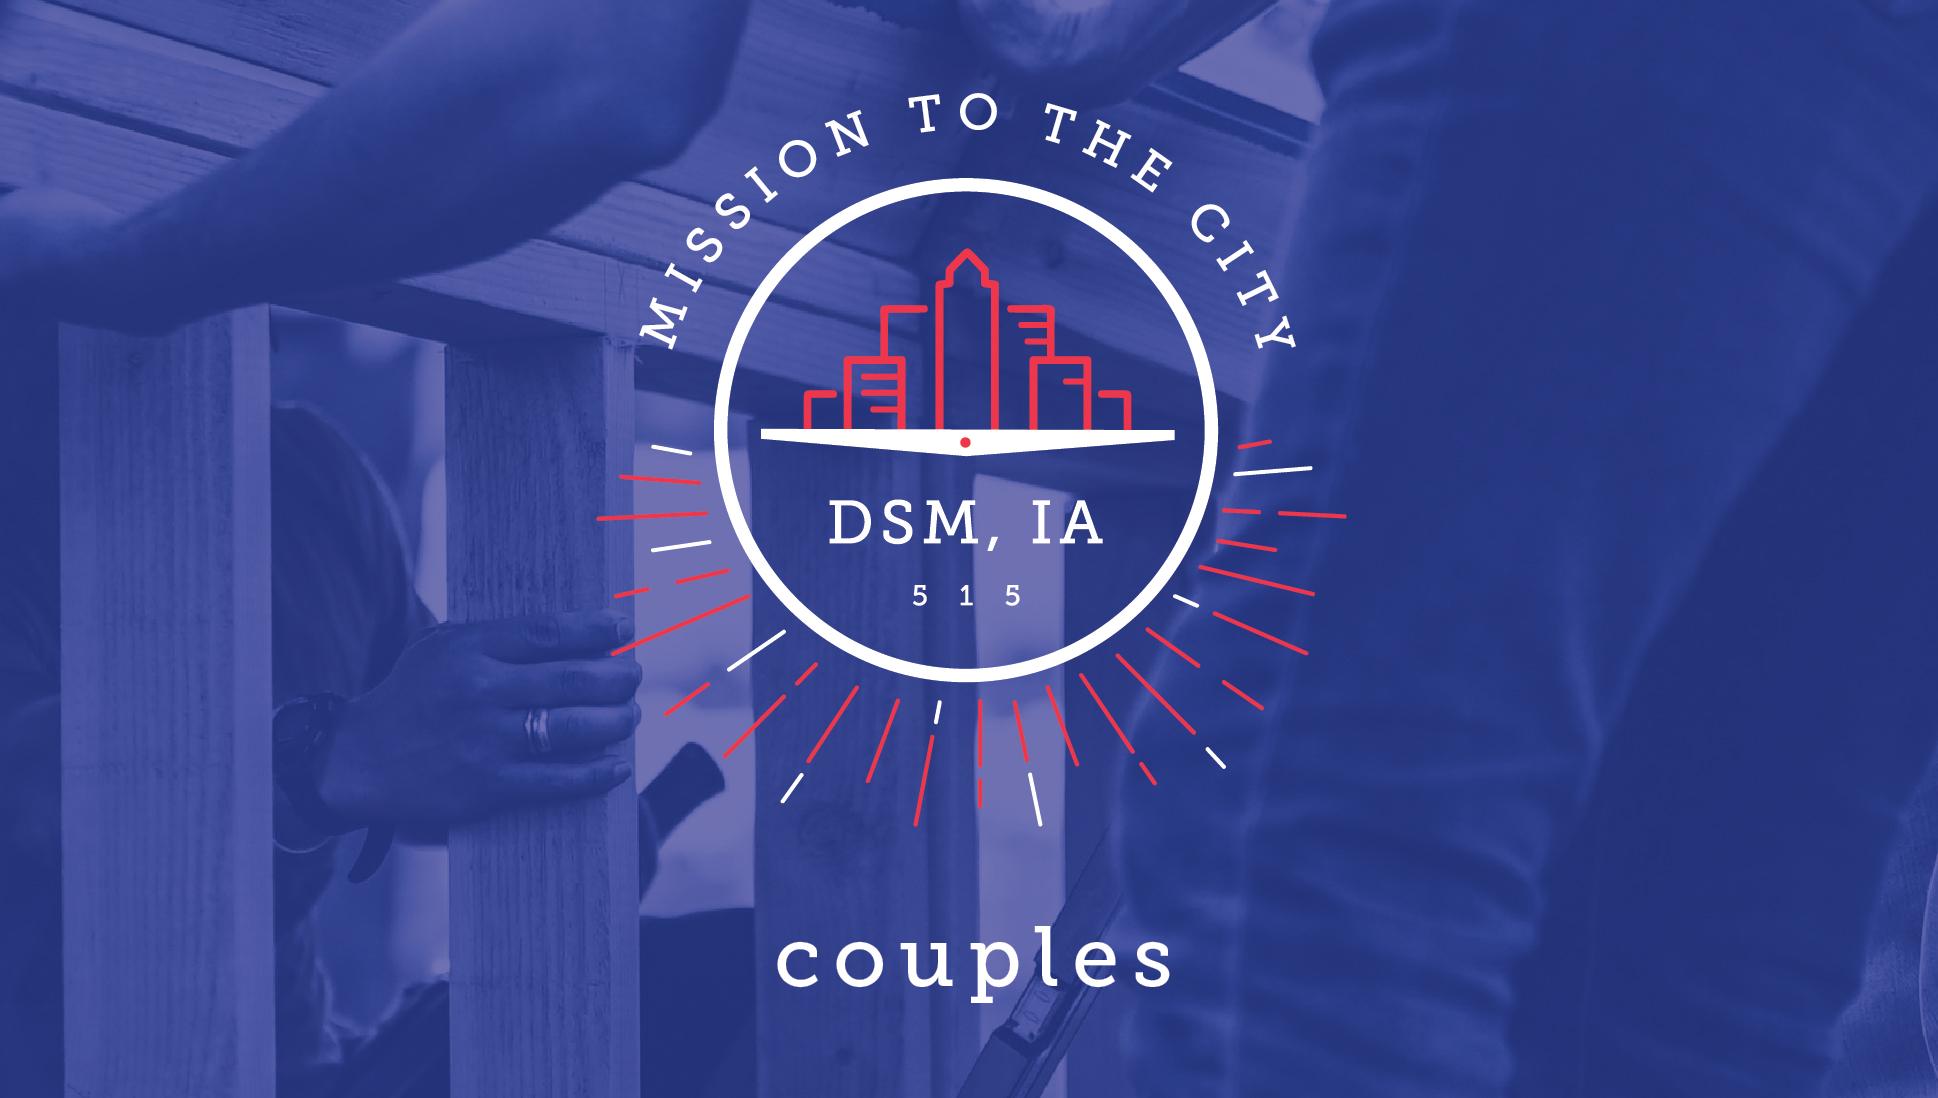 M2tc couples 01